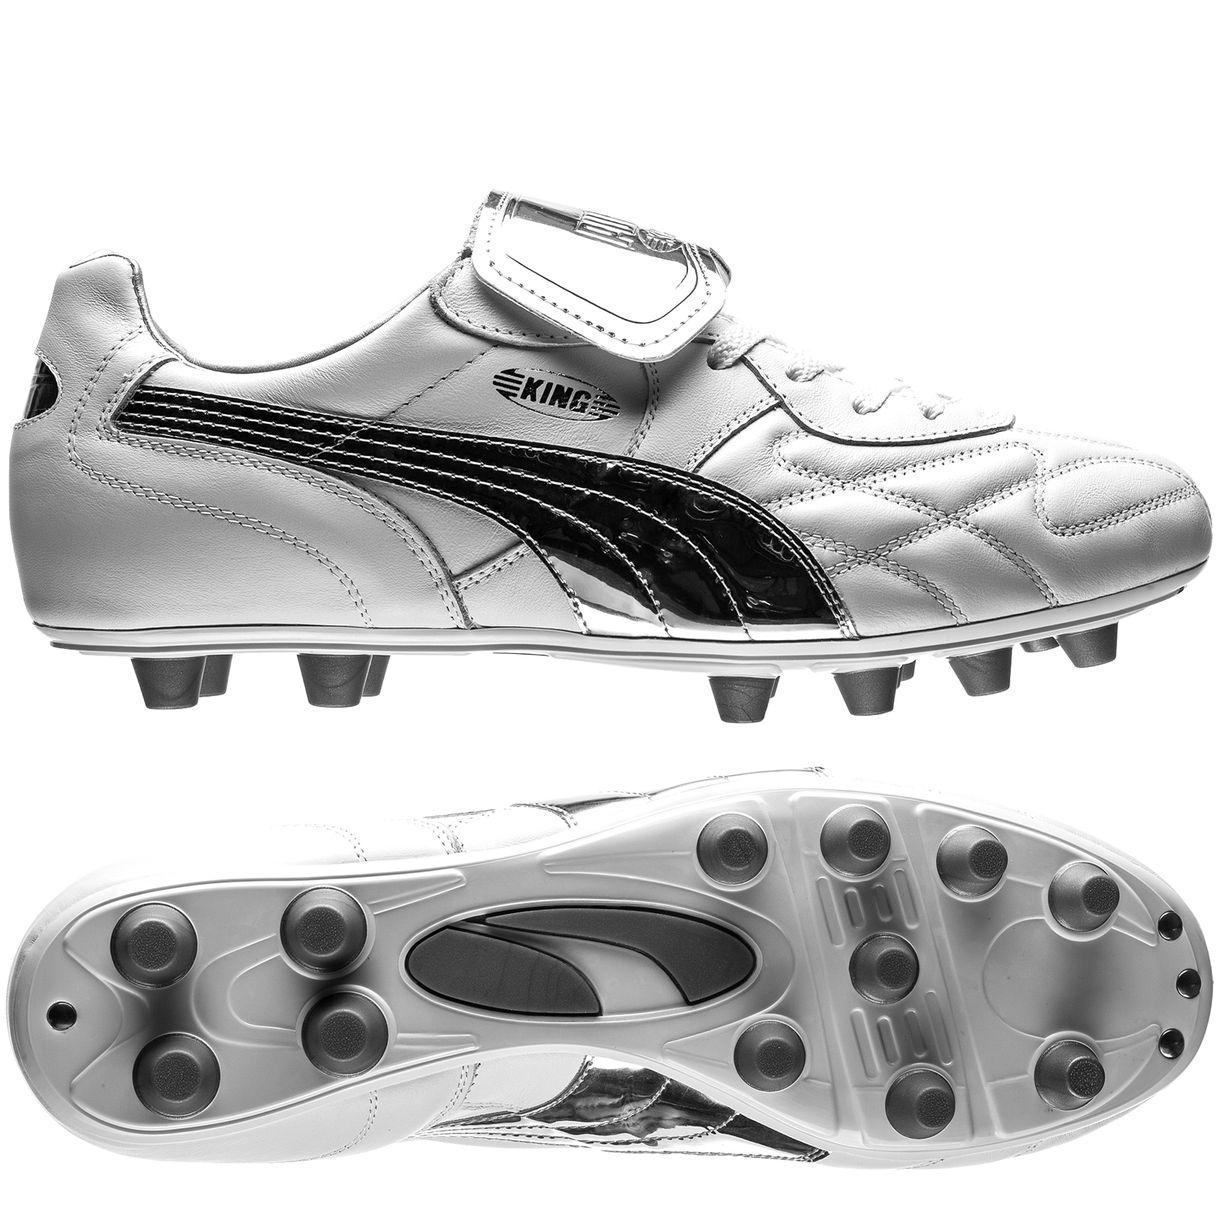 Puma King Voetbalschoenen - Voetbal-schoenen.eu